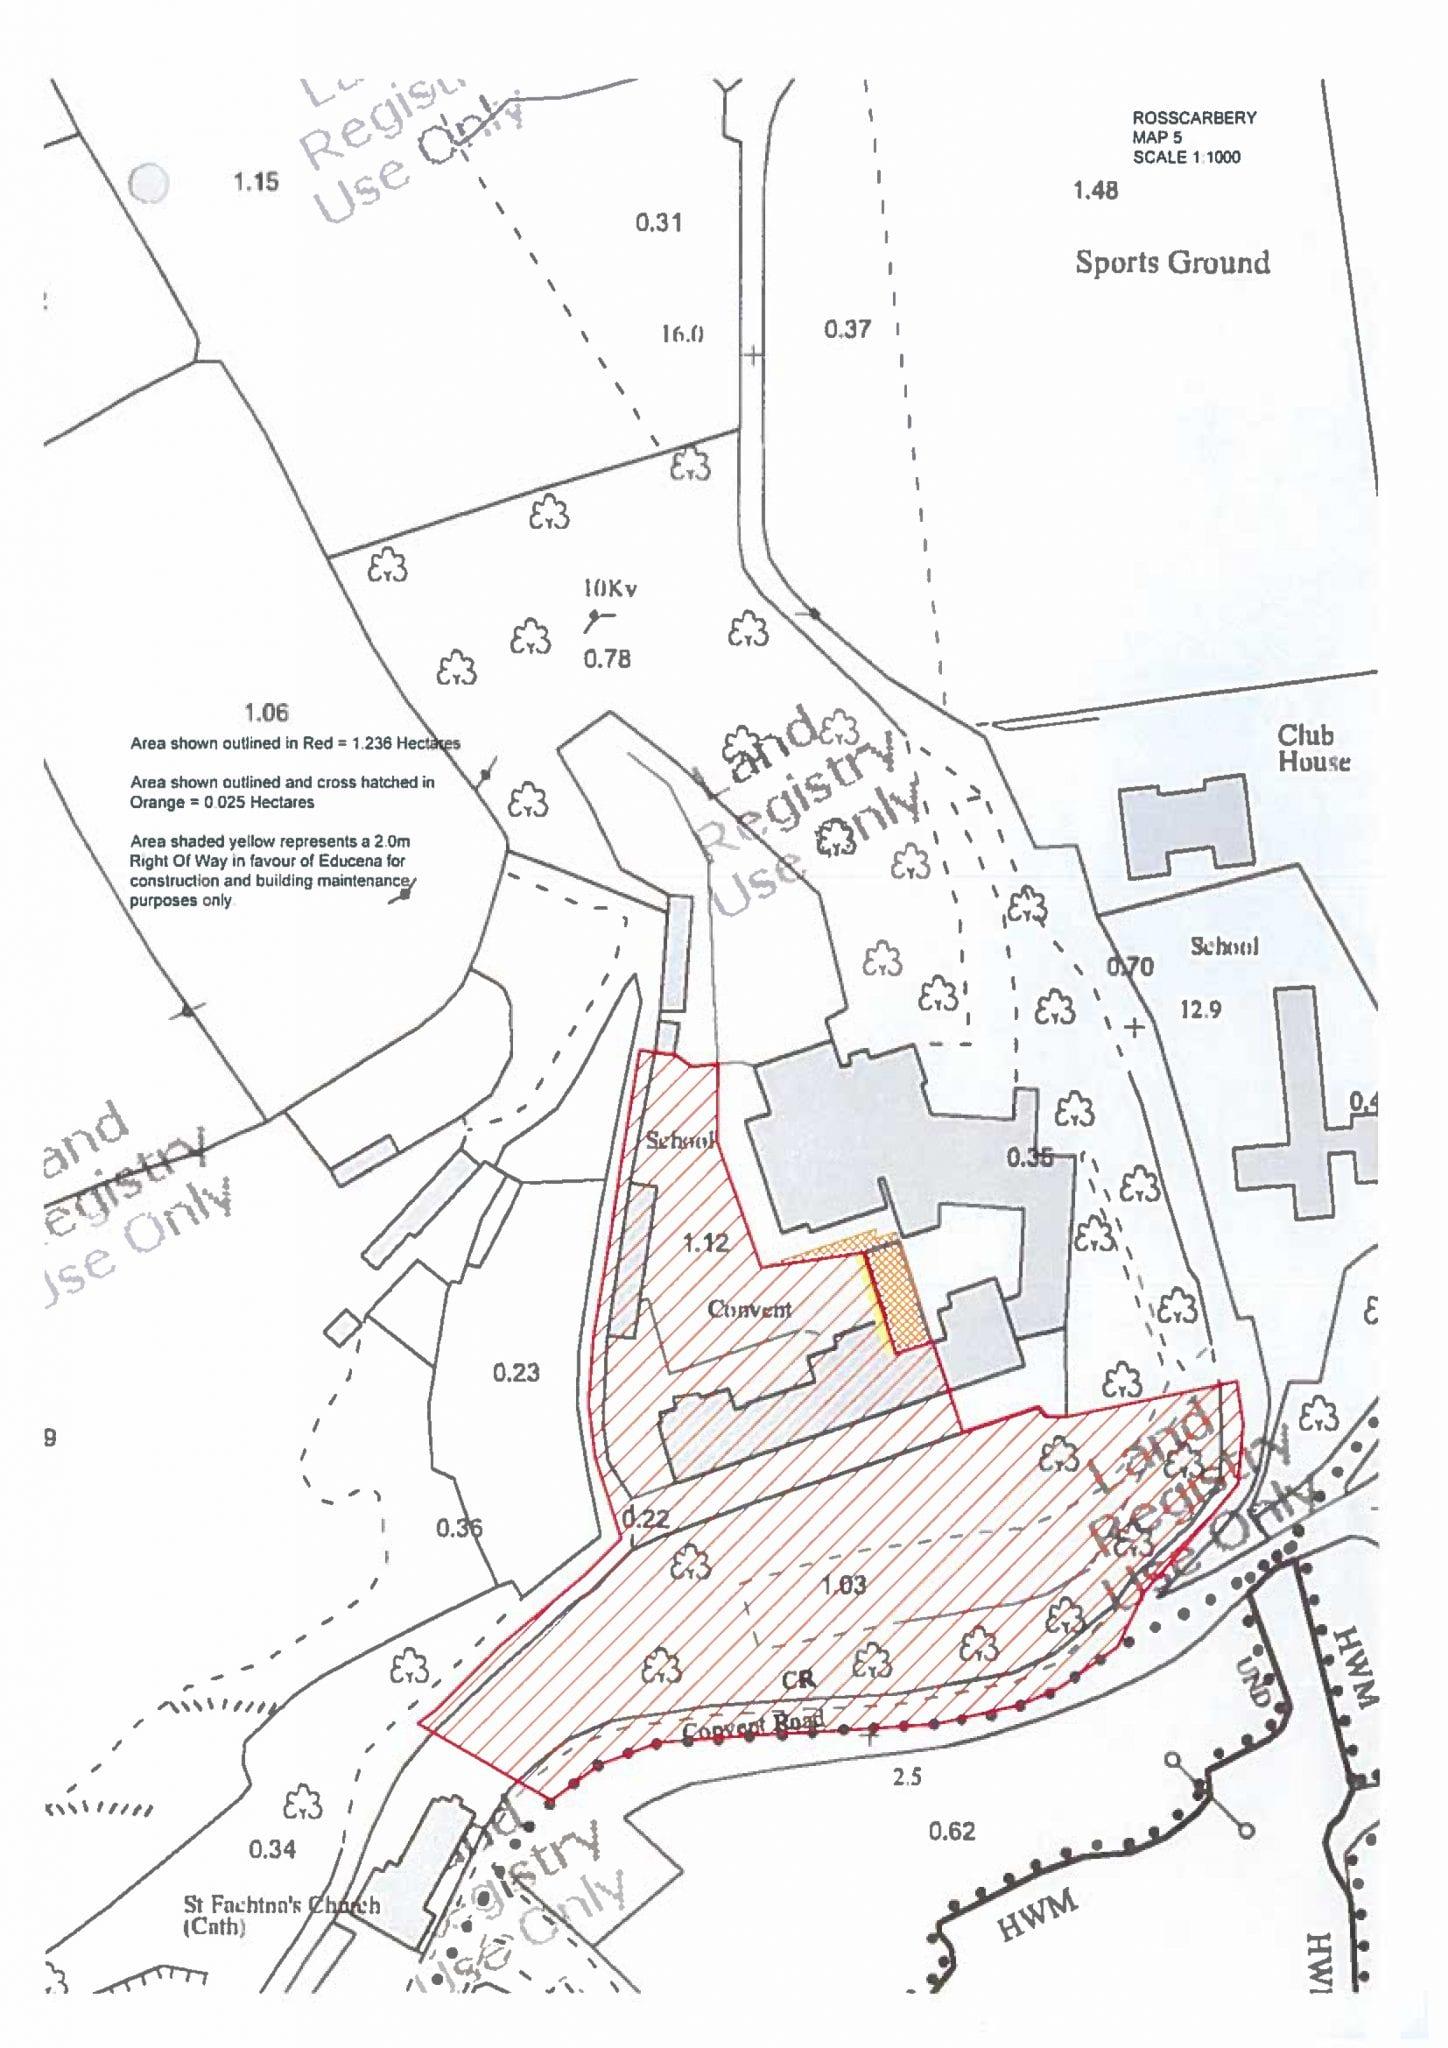 DOC175 REV MAP CONVENT